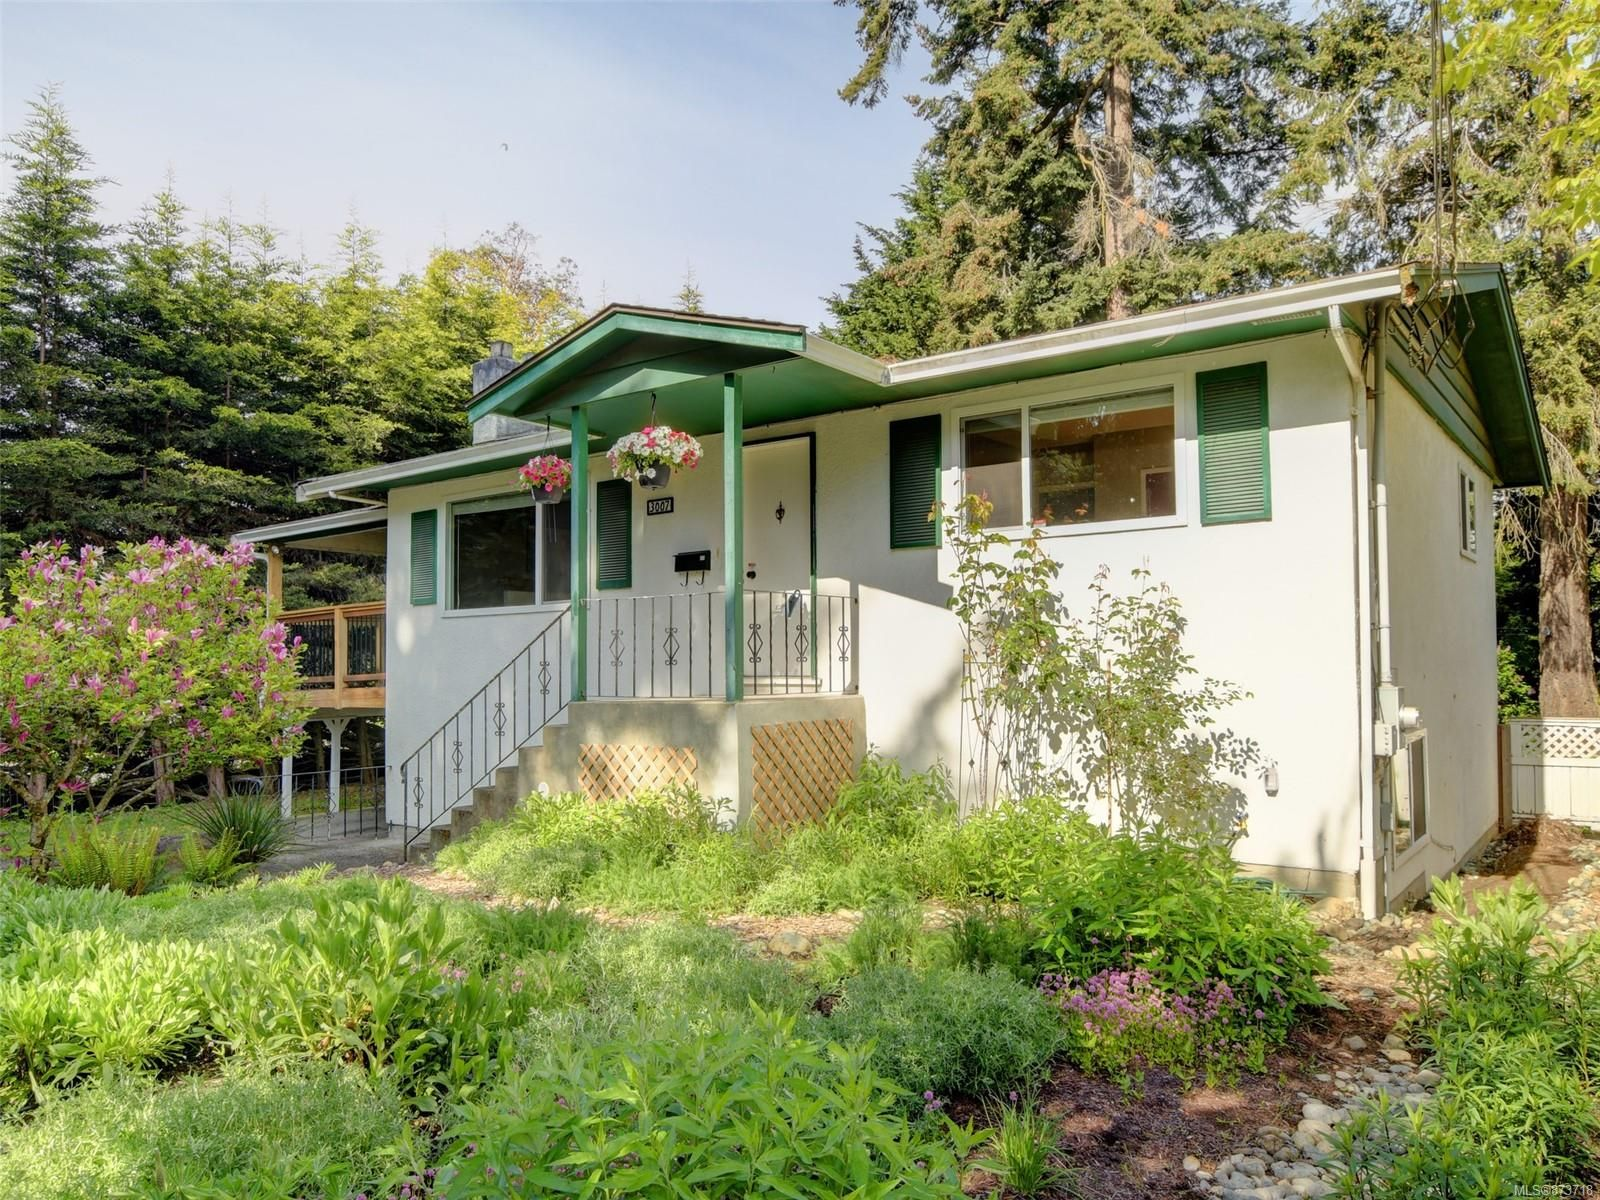 Main Photo: 3007 Selmar Rd in : La Glen Lake House for sale (Langford)  : MLS®# 873718